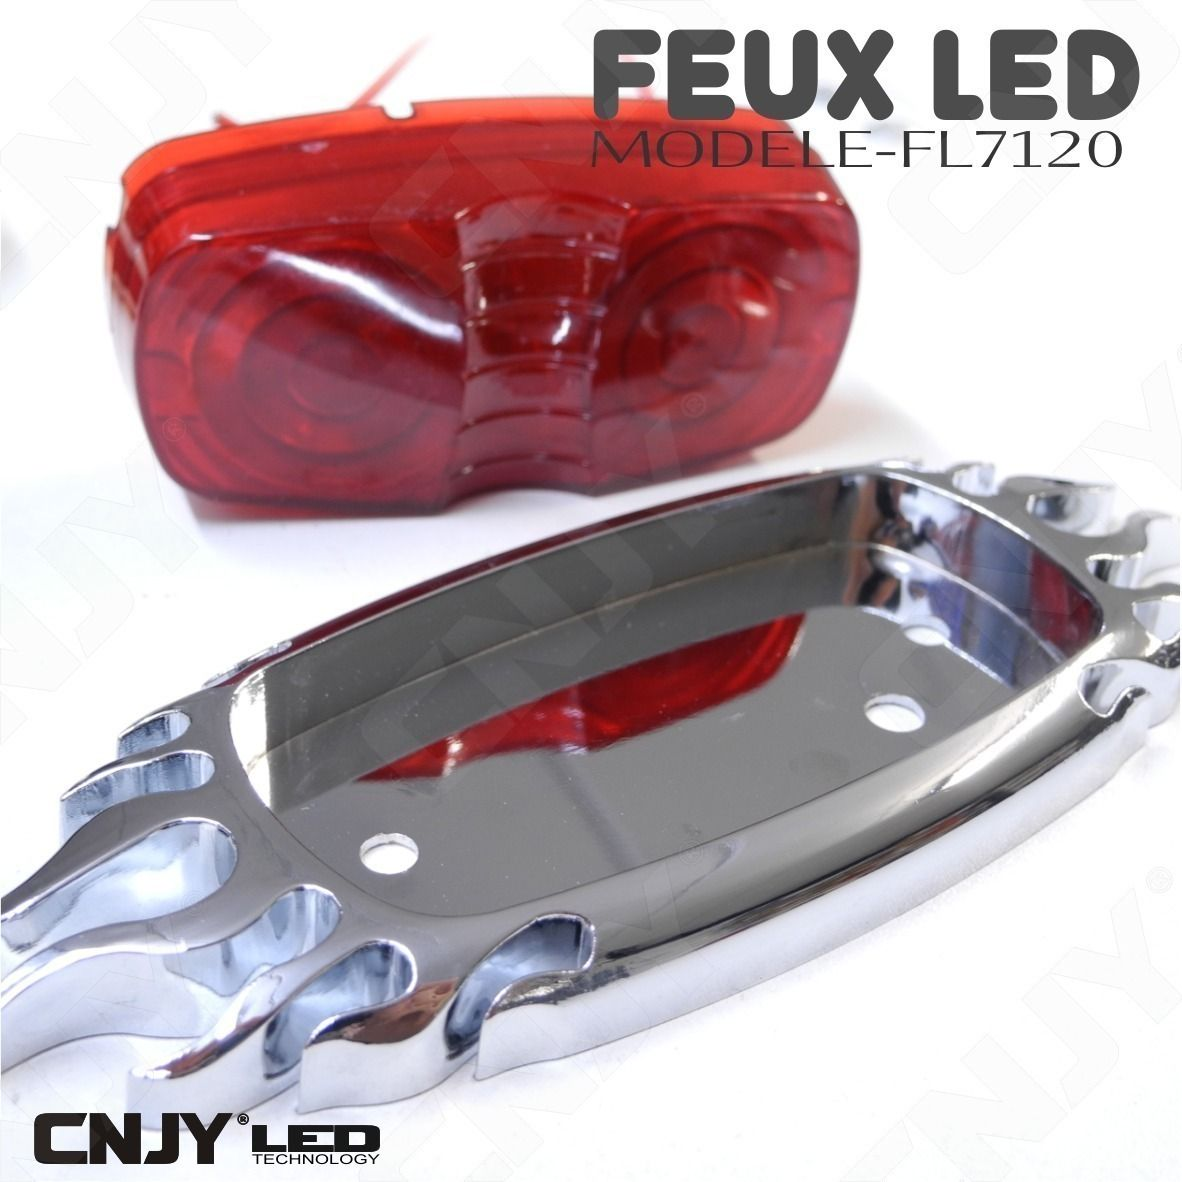 feux, flaming, flamme, stop, position, a, led, rouge, auto, moto, quad, chopper, topcase, 12v